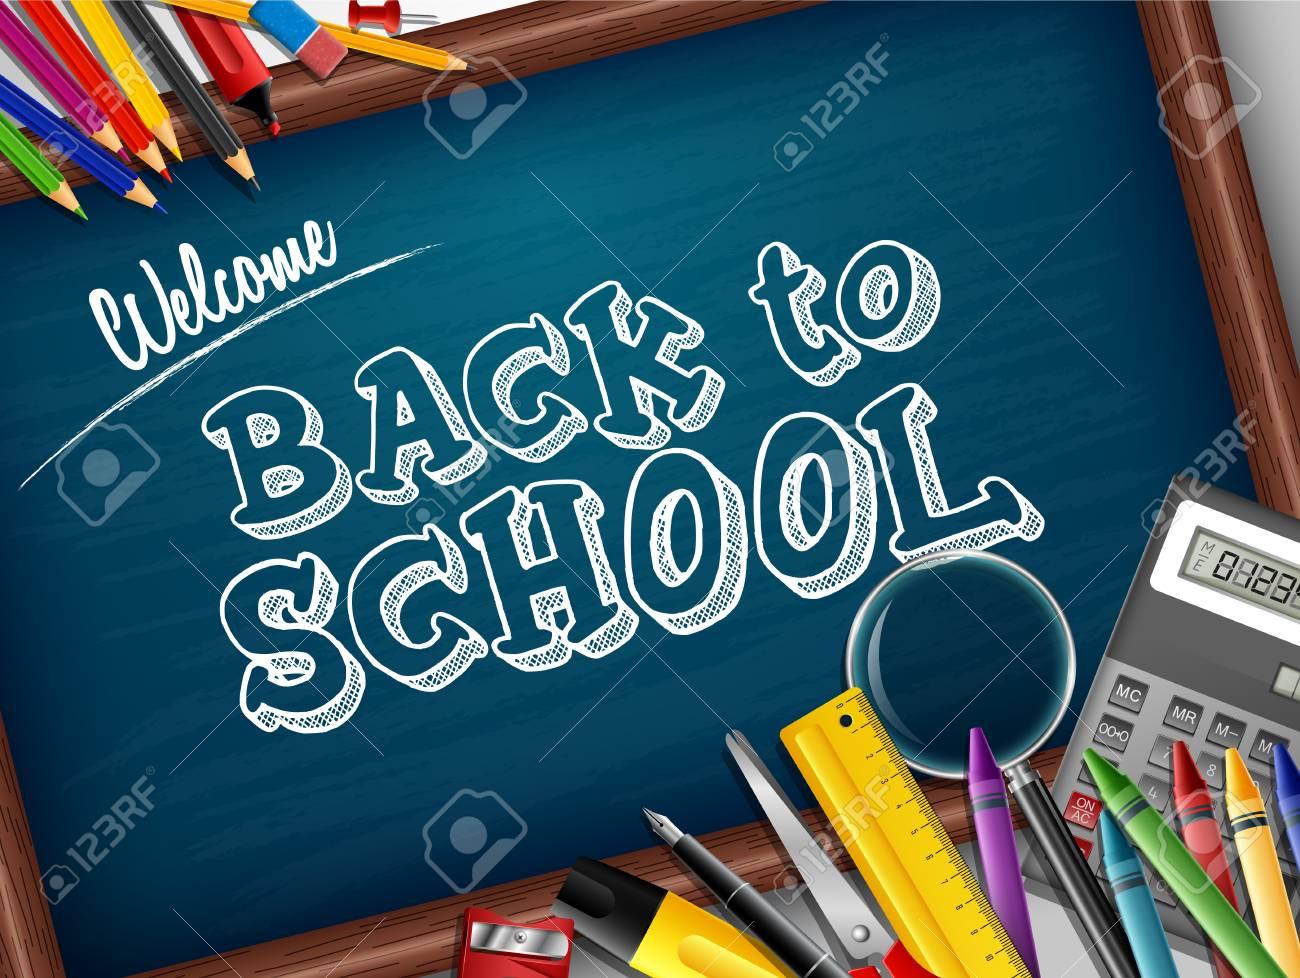 Cartoon school supplies - 100402759